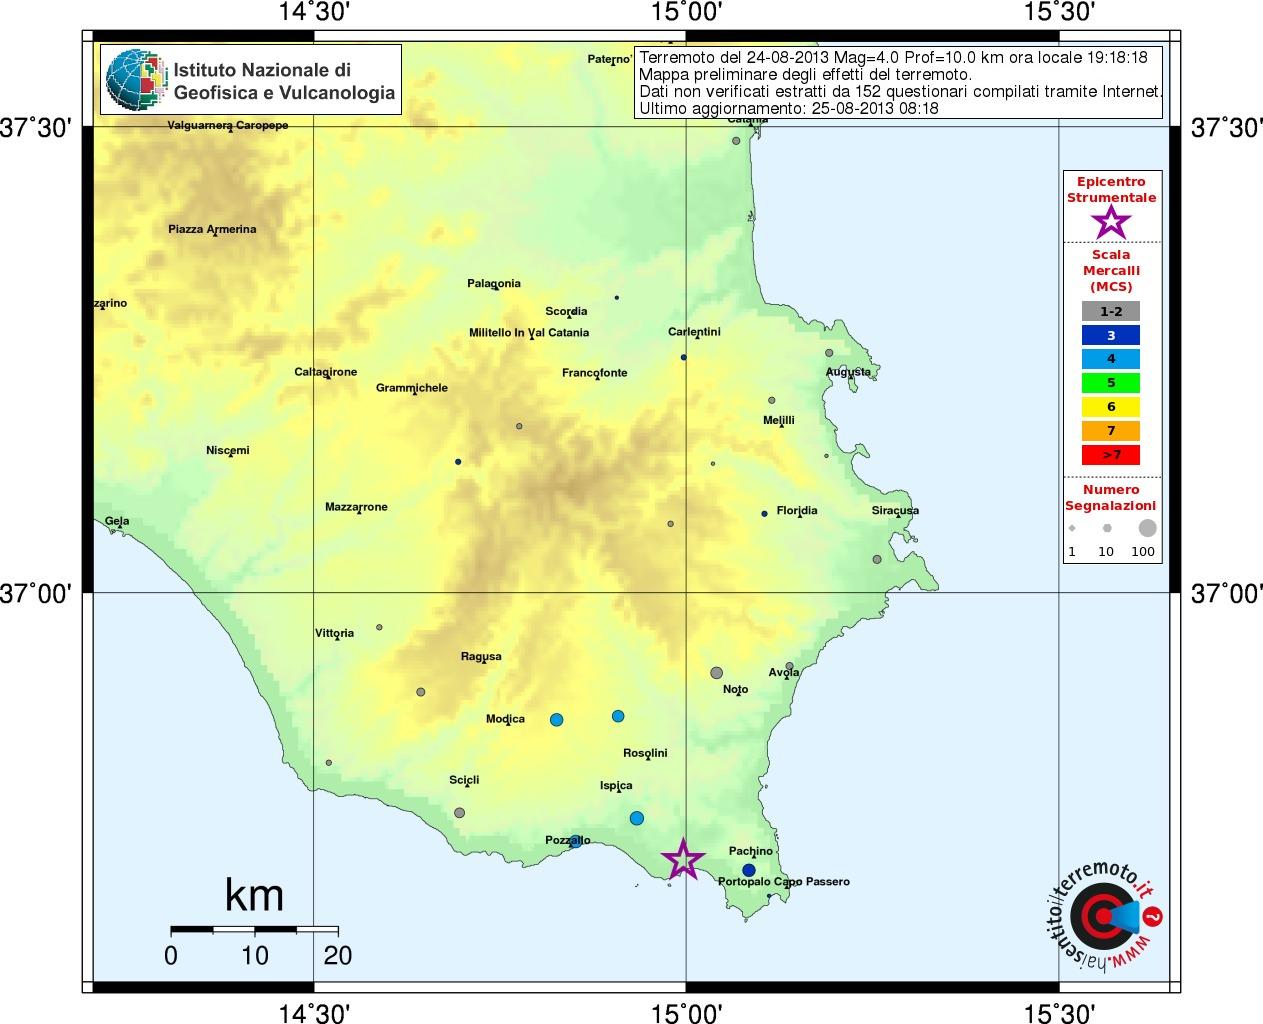 Evento sismico in sicilia sud orientale ingvterremoti mappa thecheapjerseys Image collections